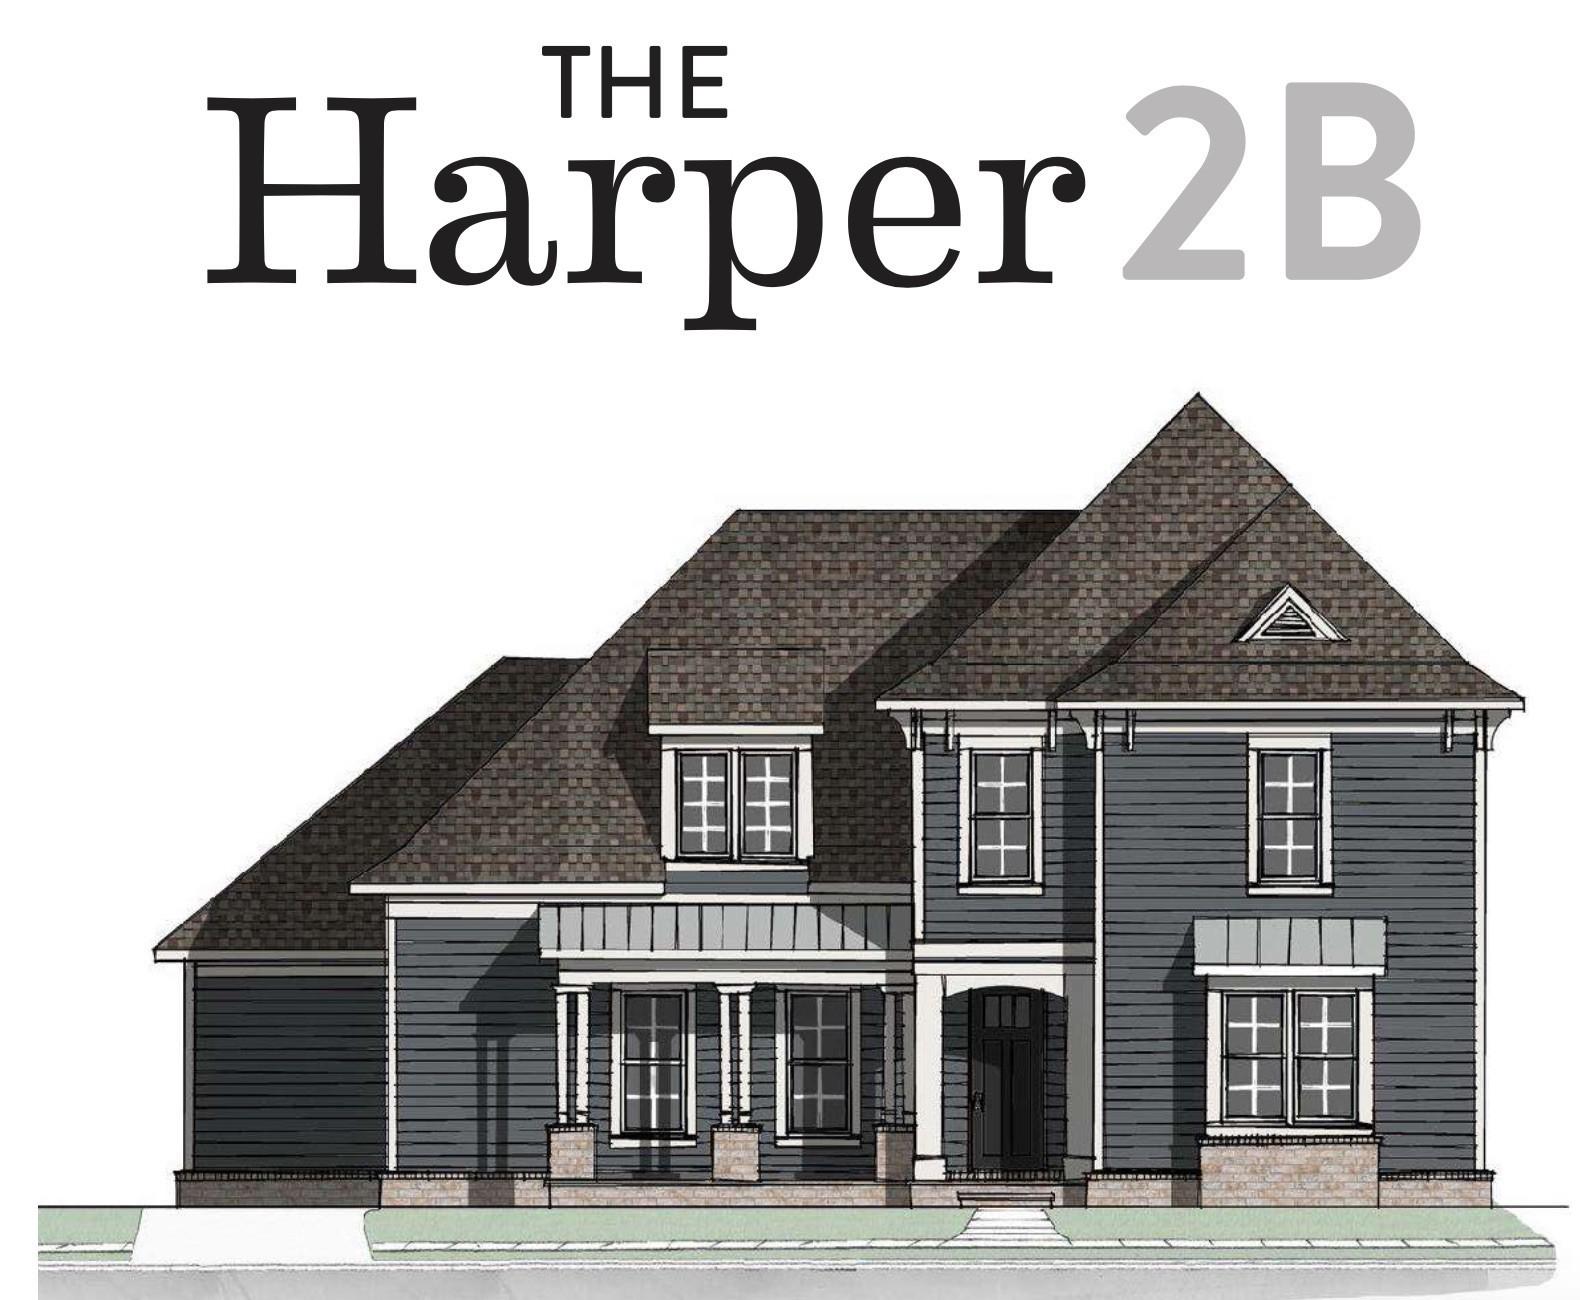 299 Croft Way #623, Mount Juliet, TN 37122 - Mount Juliet, TN real estate listing